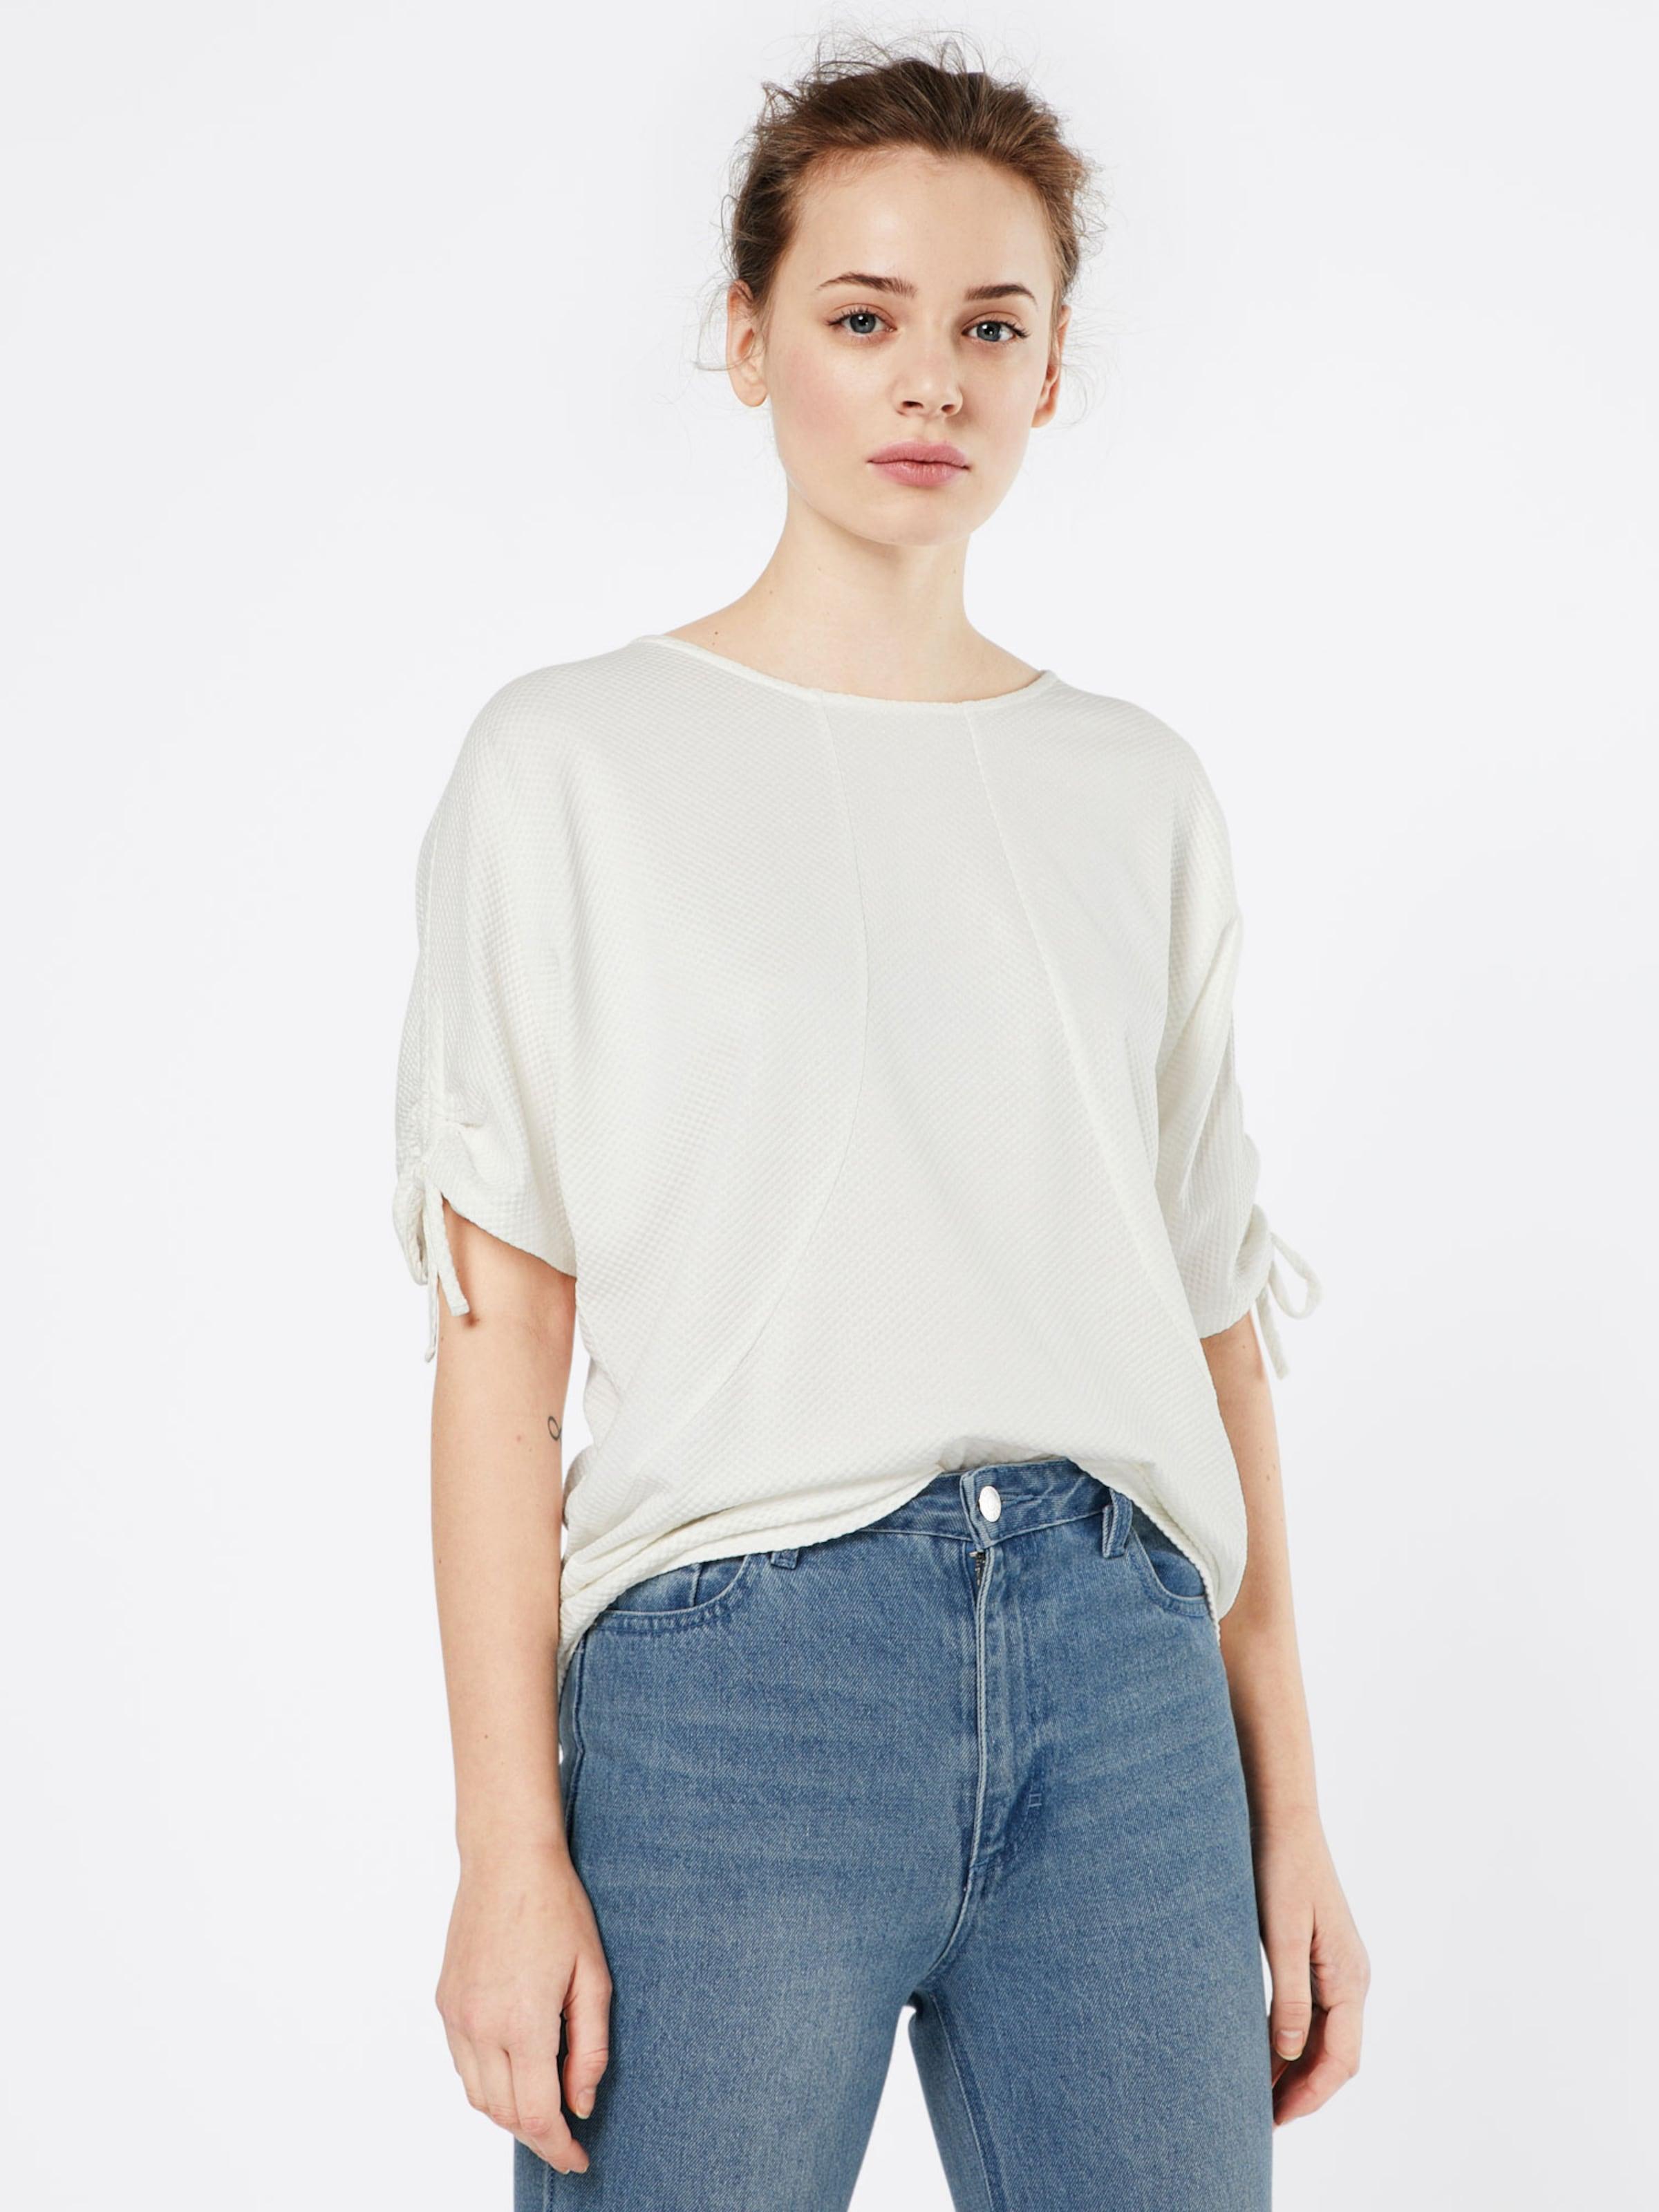 Betty & Co strukturiertes Shirt